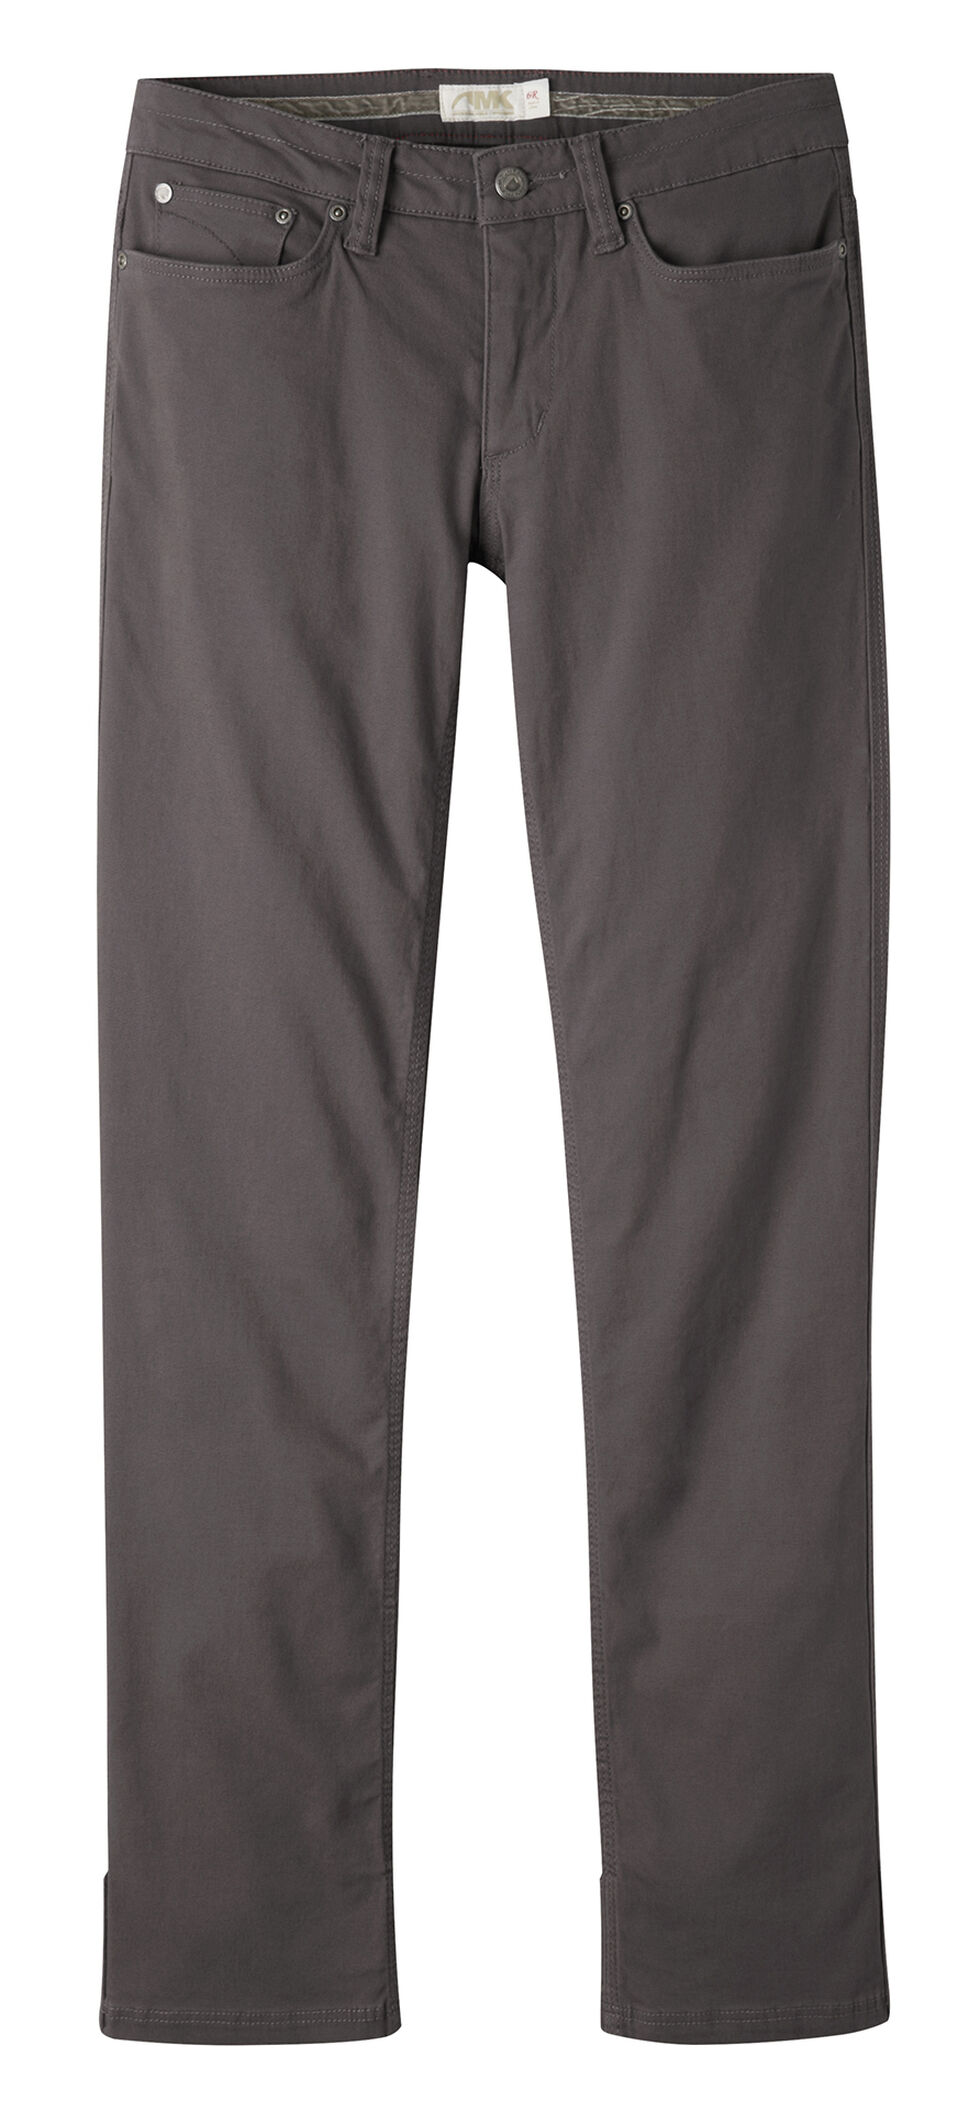 Mountain Khakis Women's Classic Fit Camber 106 Pants, Slate, hi-res